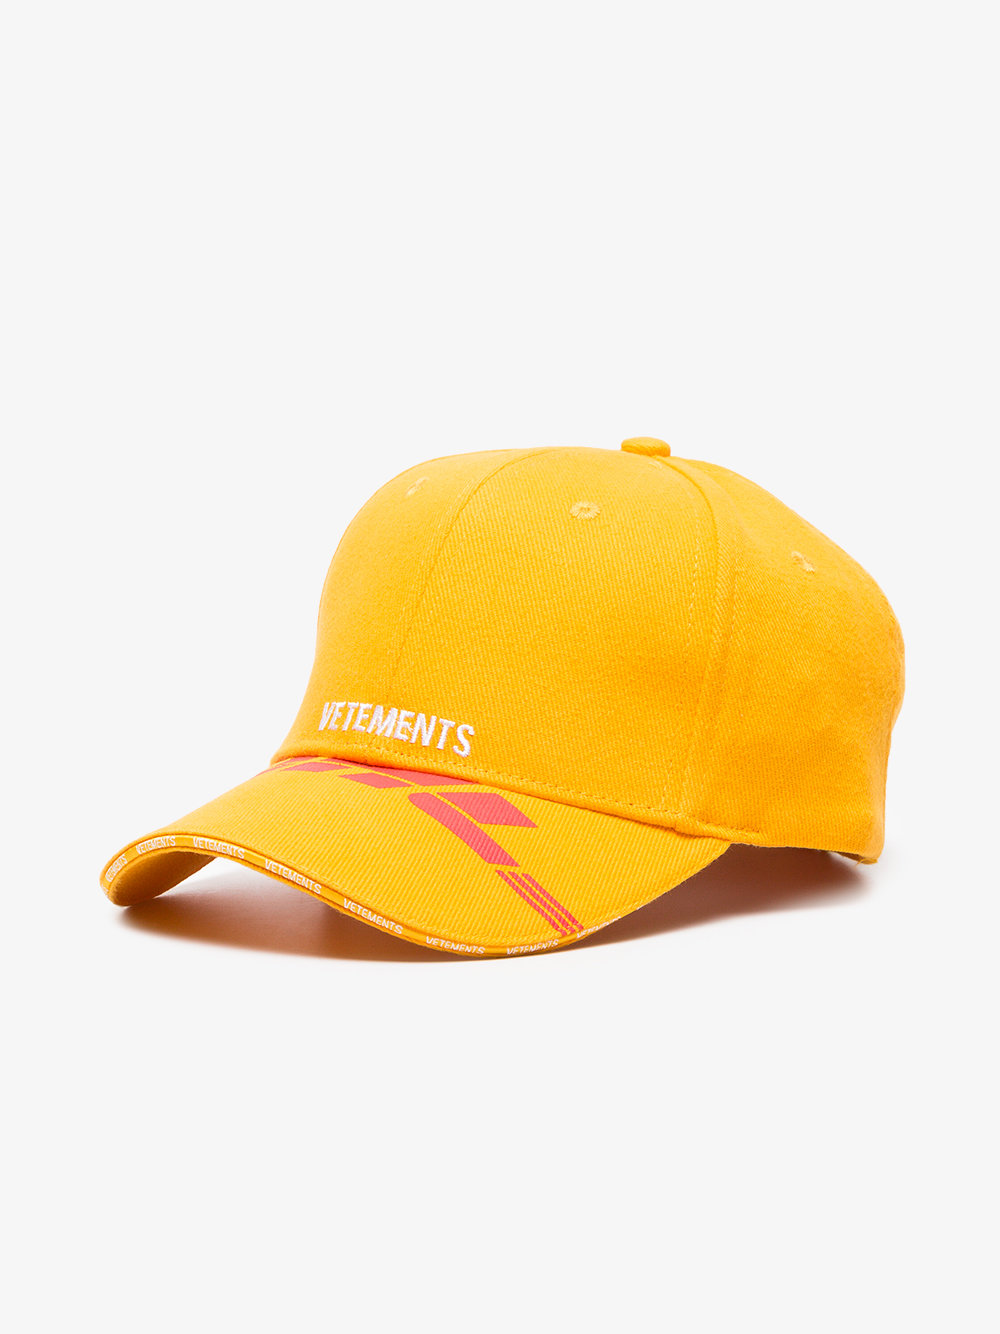 Yellow DHL Cotton Baseball Cap イエロー/レッド